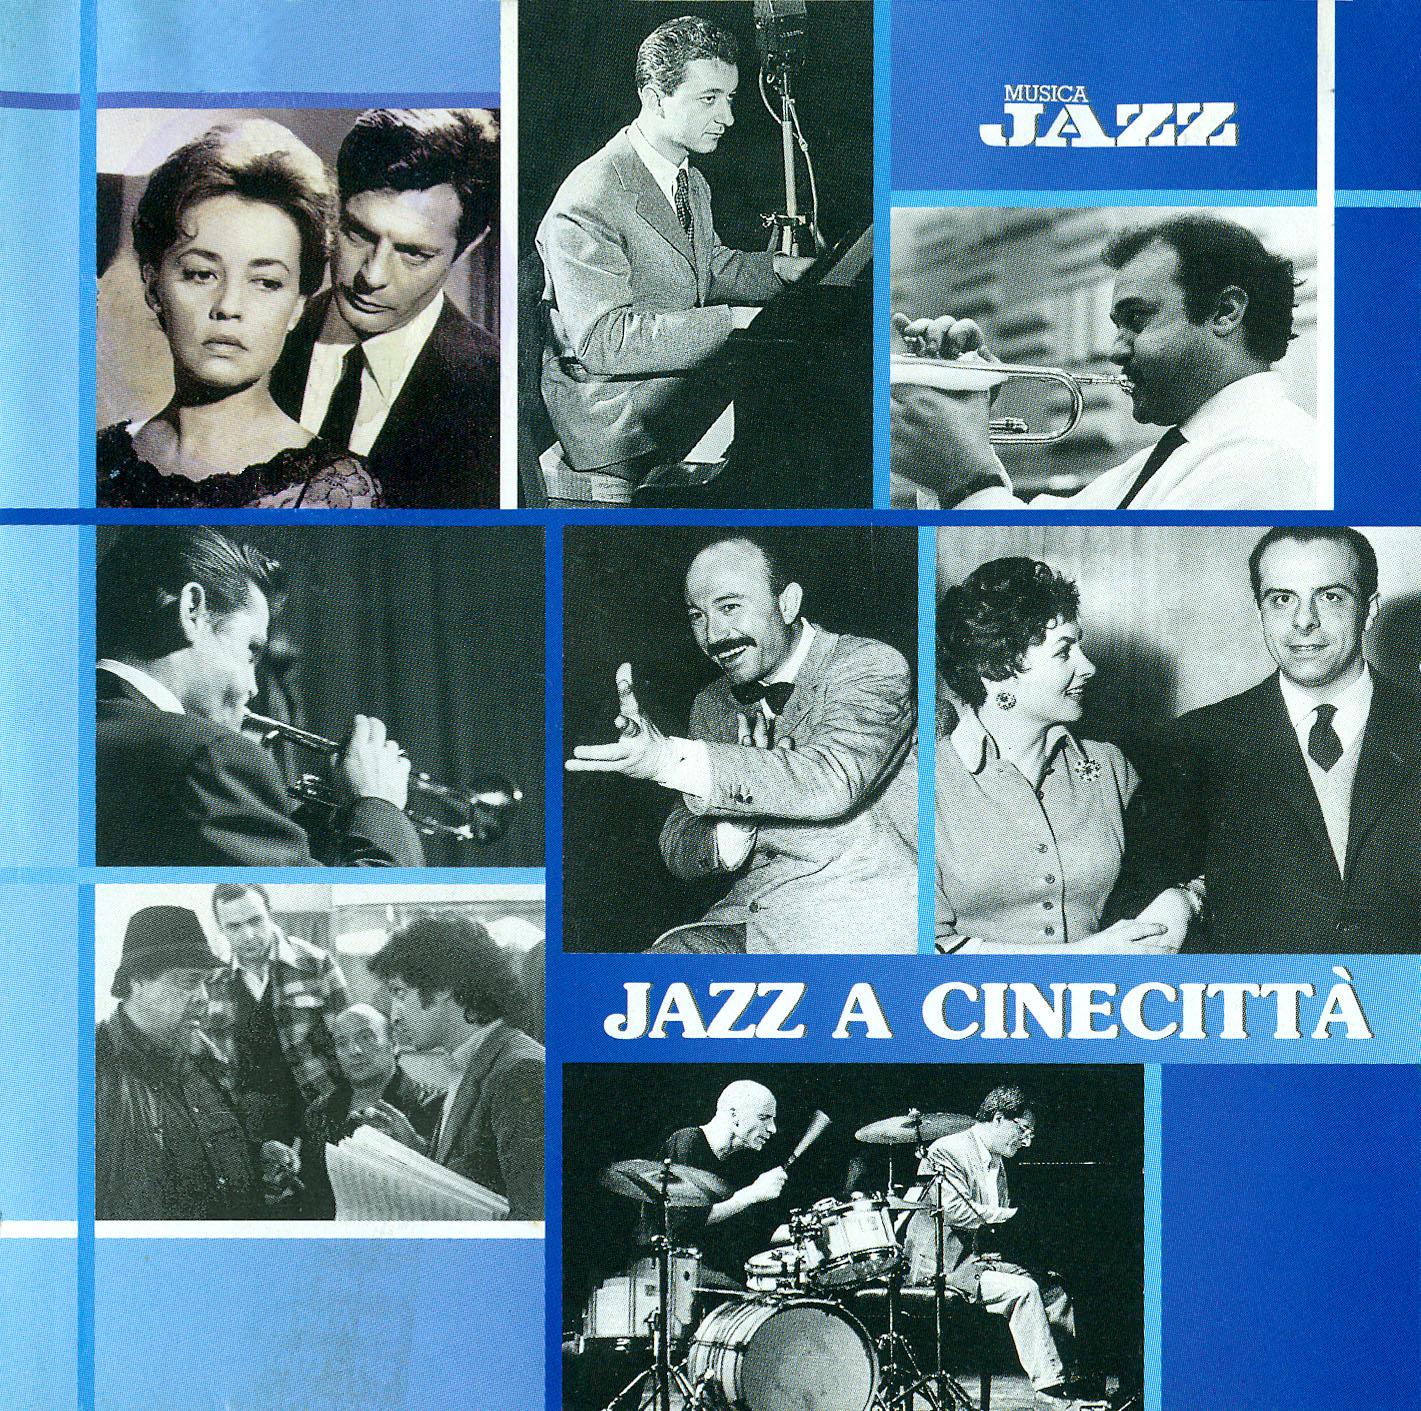 VA - Jazz A Cinecitta (2004) [Musica Jazz Magazine 10/2004